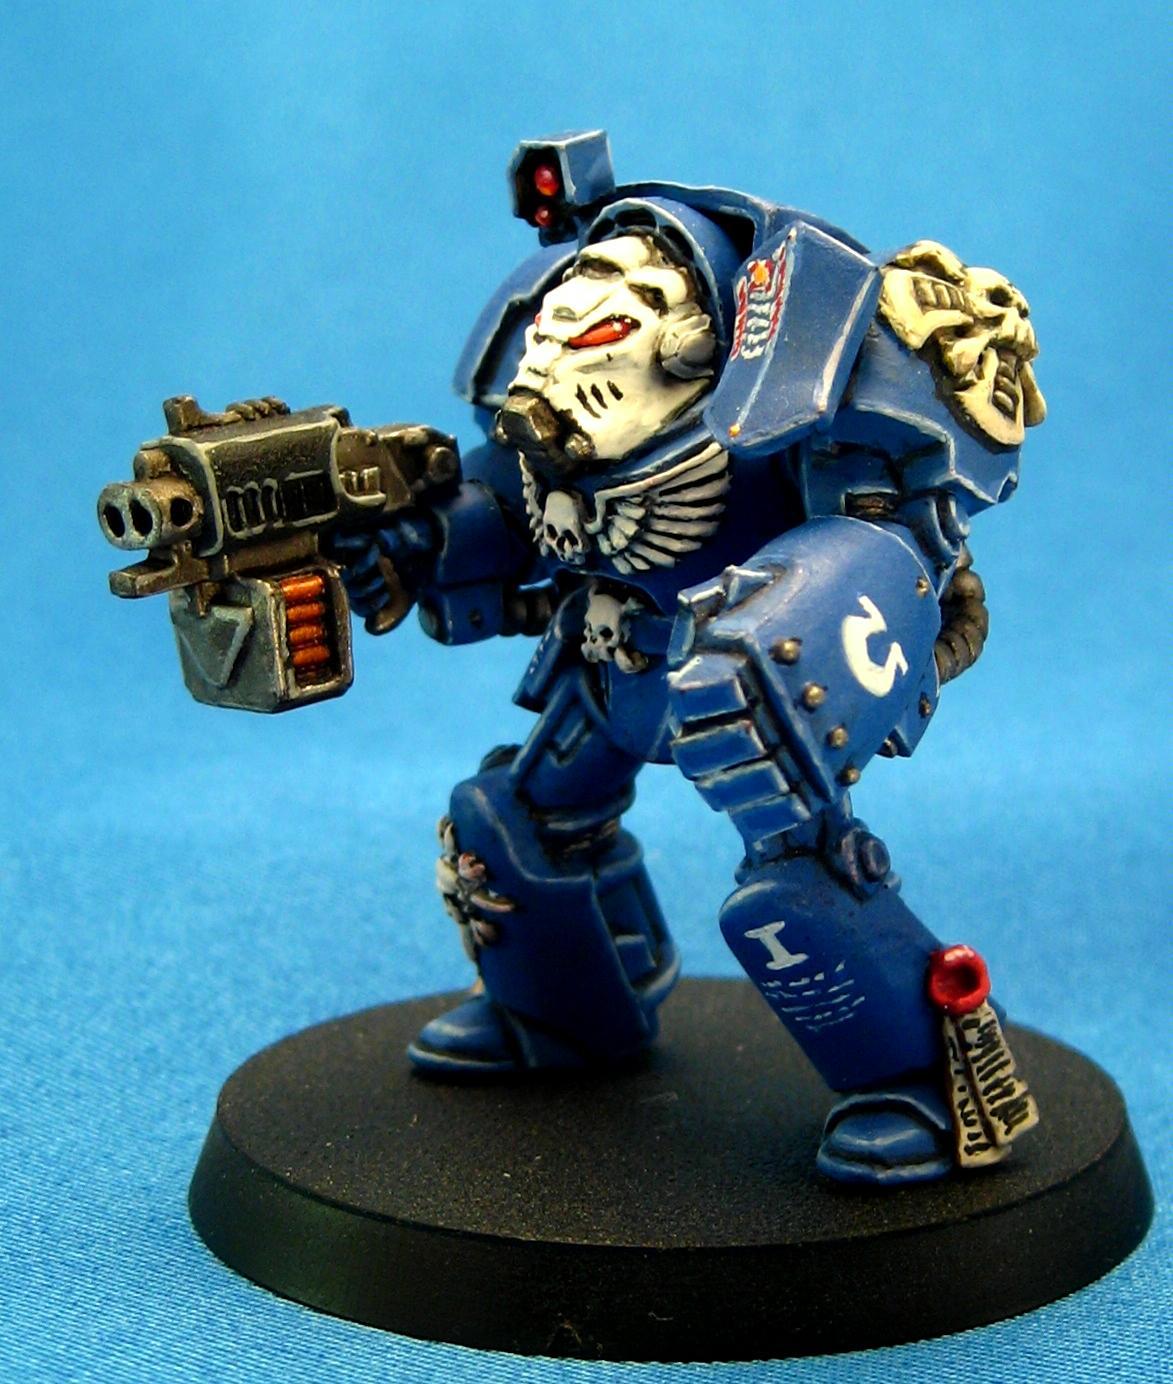 Space Marines, Terminator Armor, Ultramarines, Warhammer 40,000